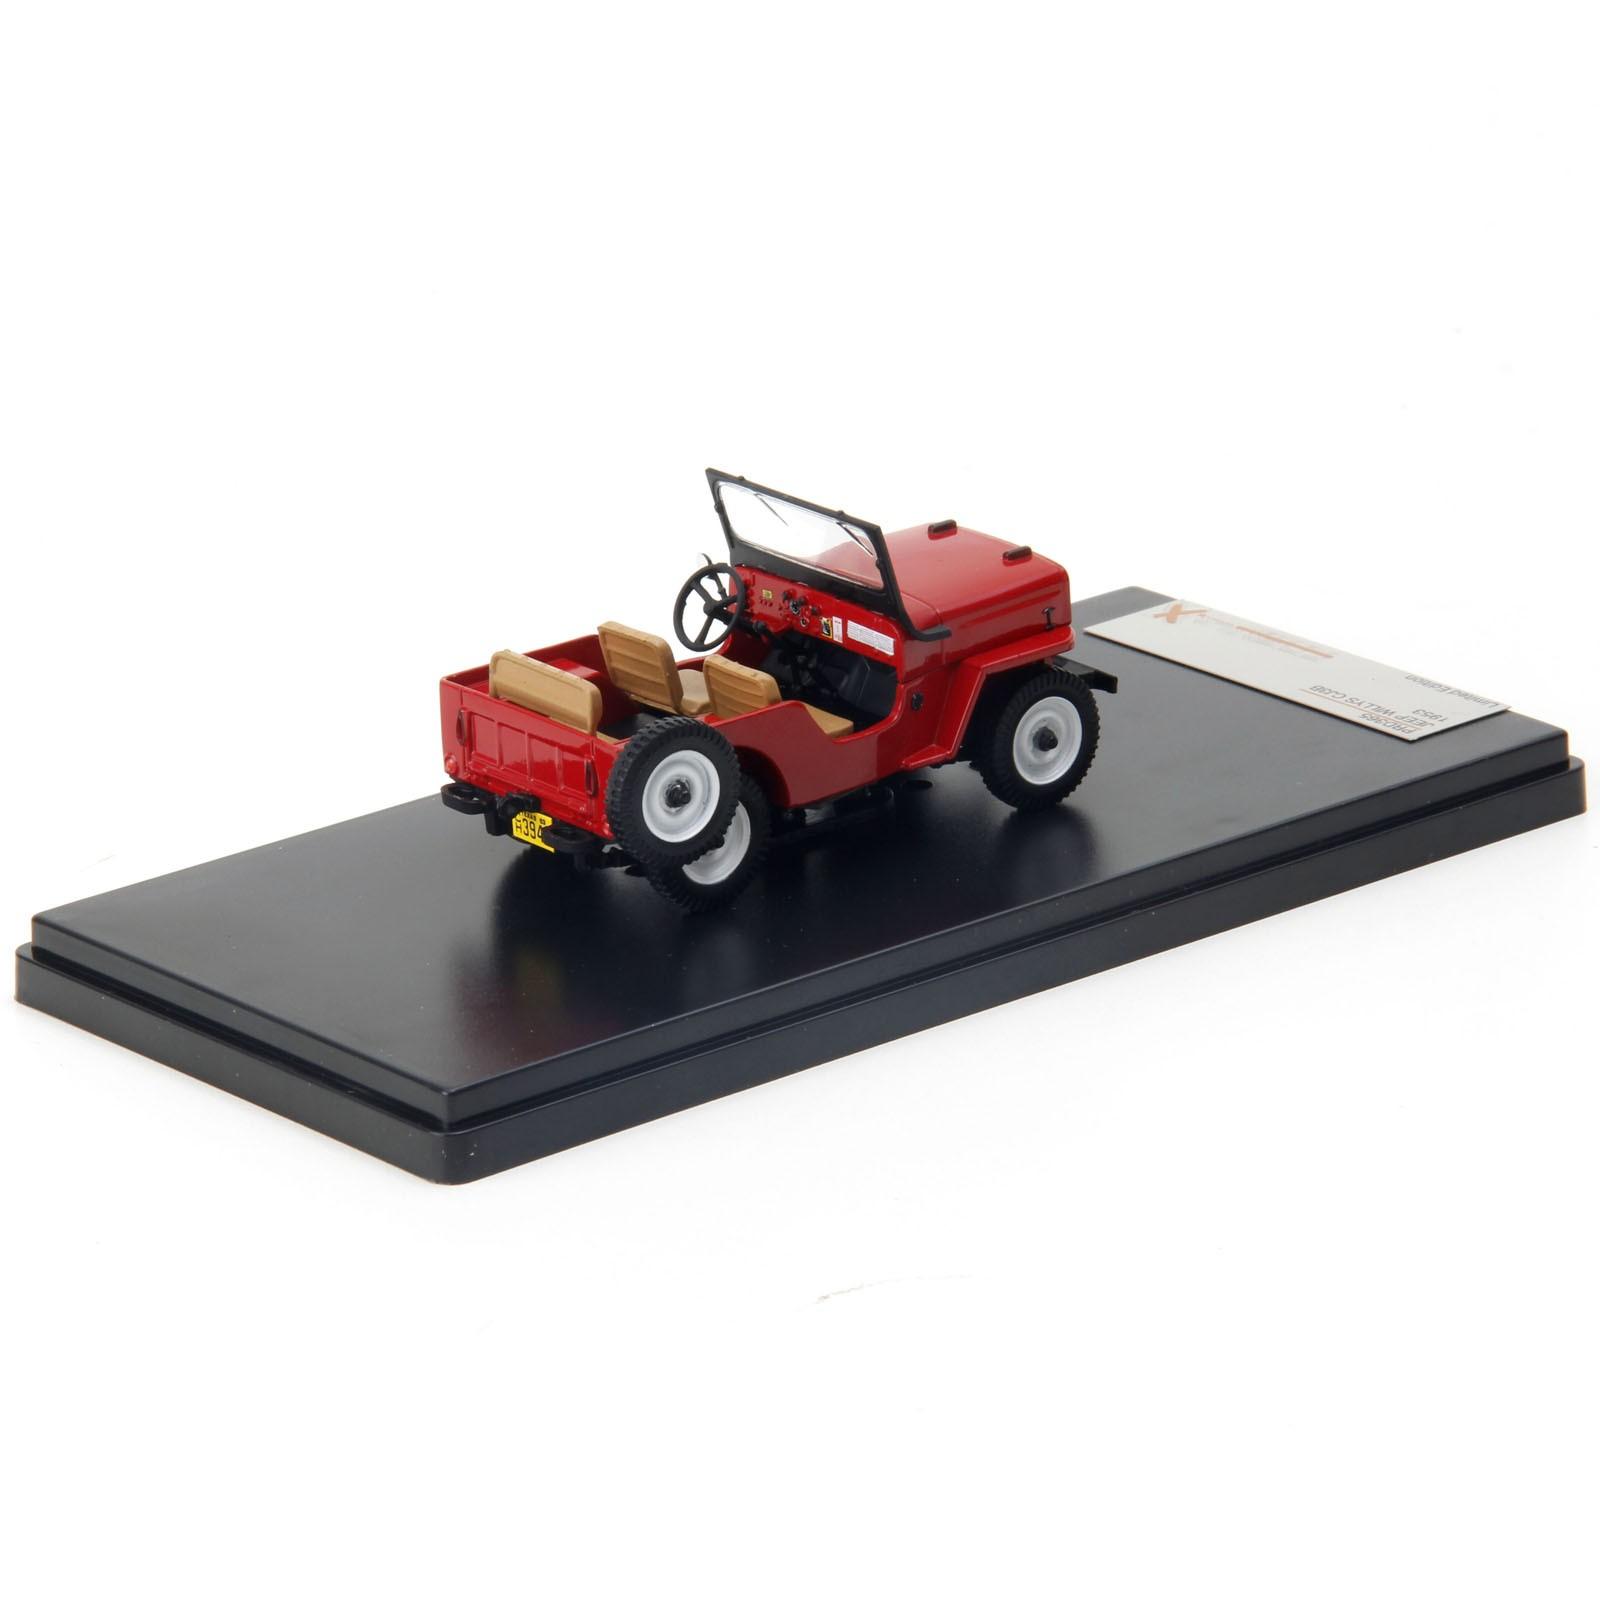 Miniatura em Metal - 1:43 - Jeep Willys CJ3B - 1953 - Vermelho